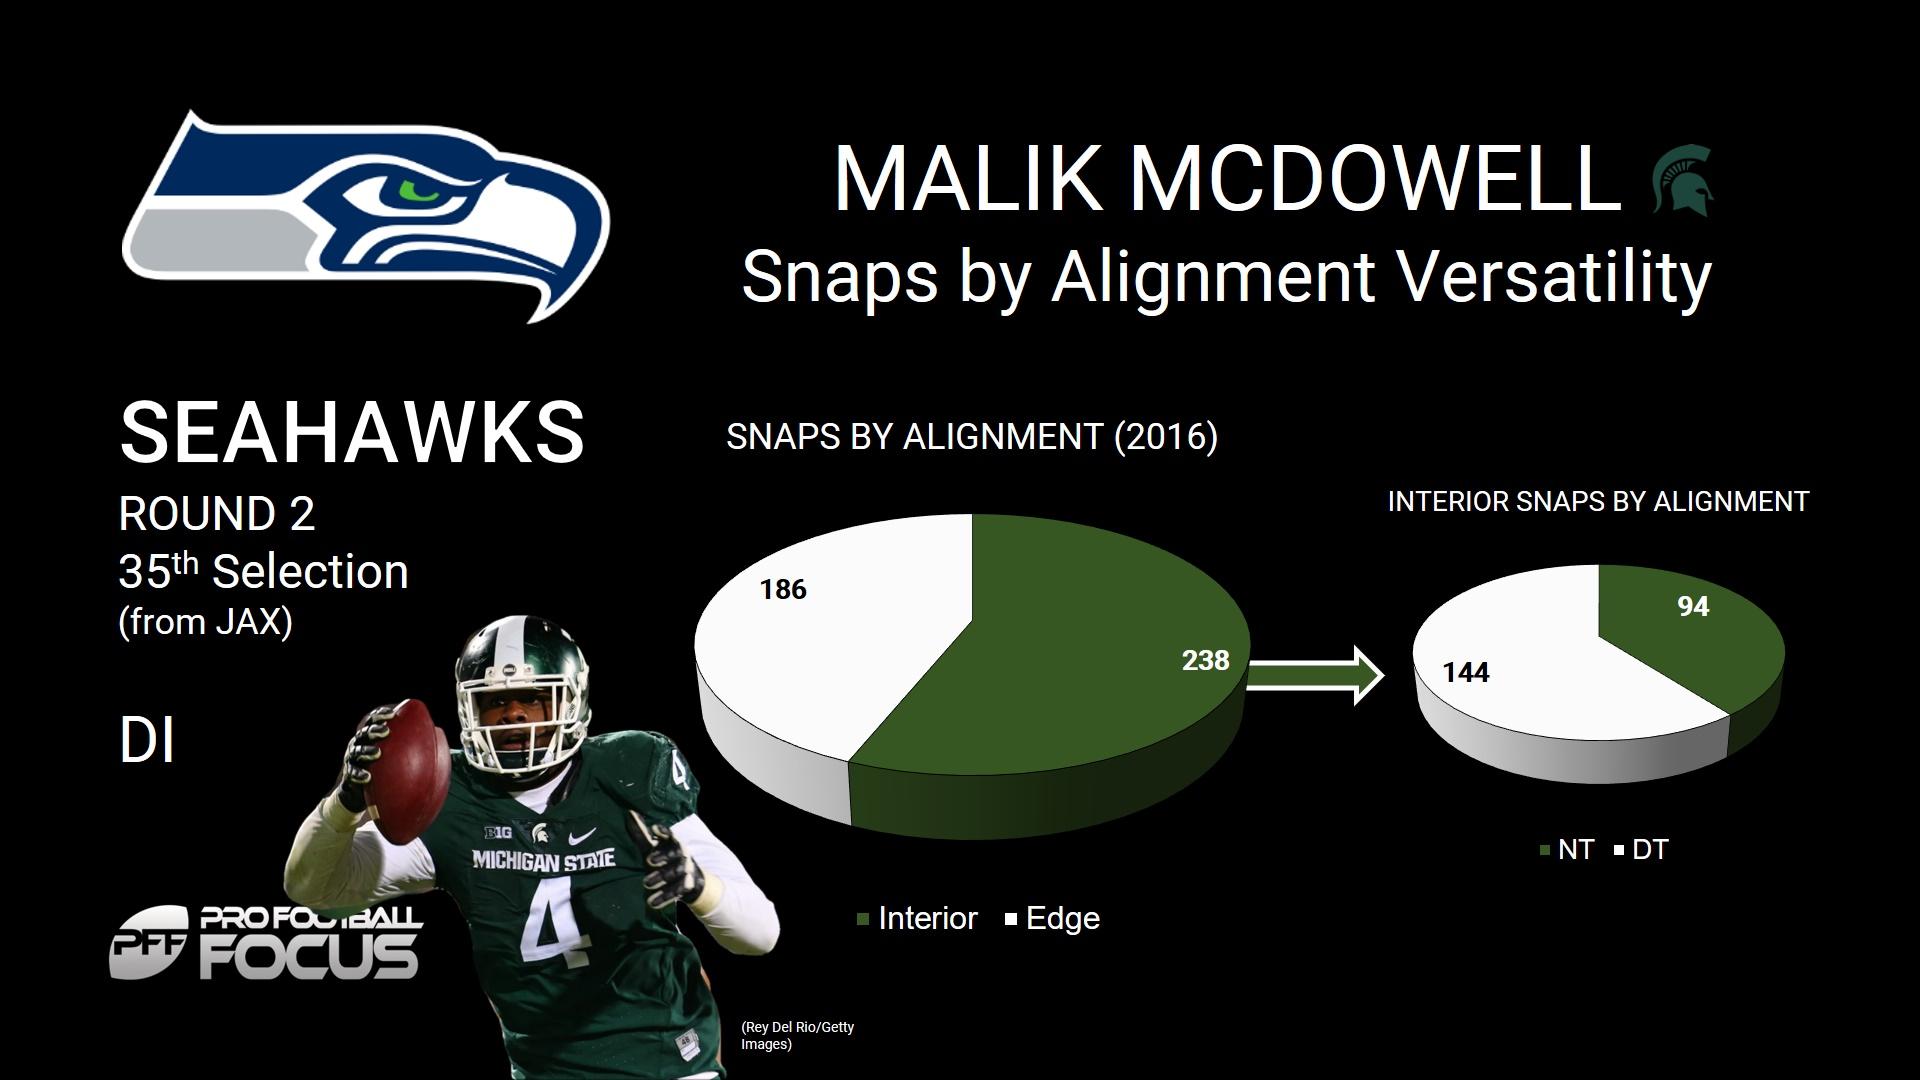 Malik McDowell